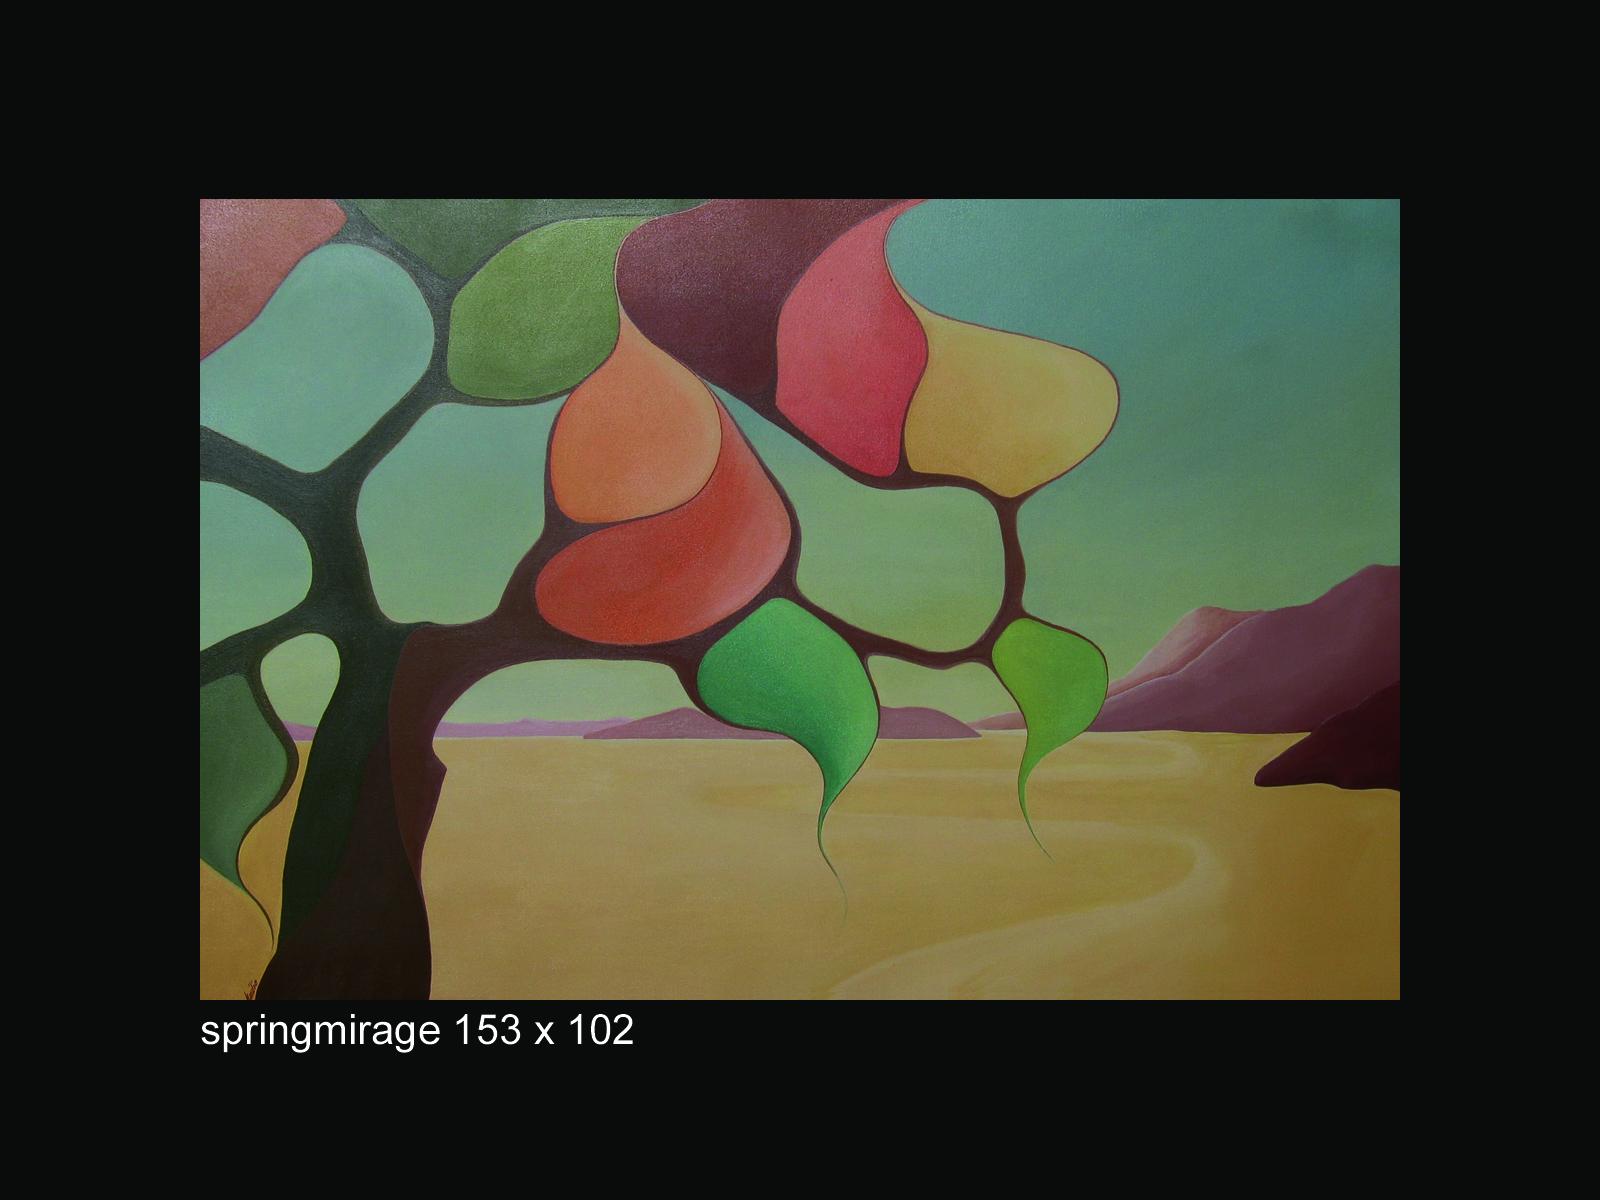 acrylic_springmirage_153x102a